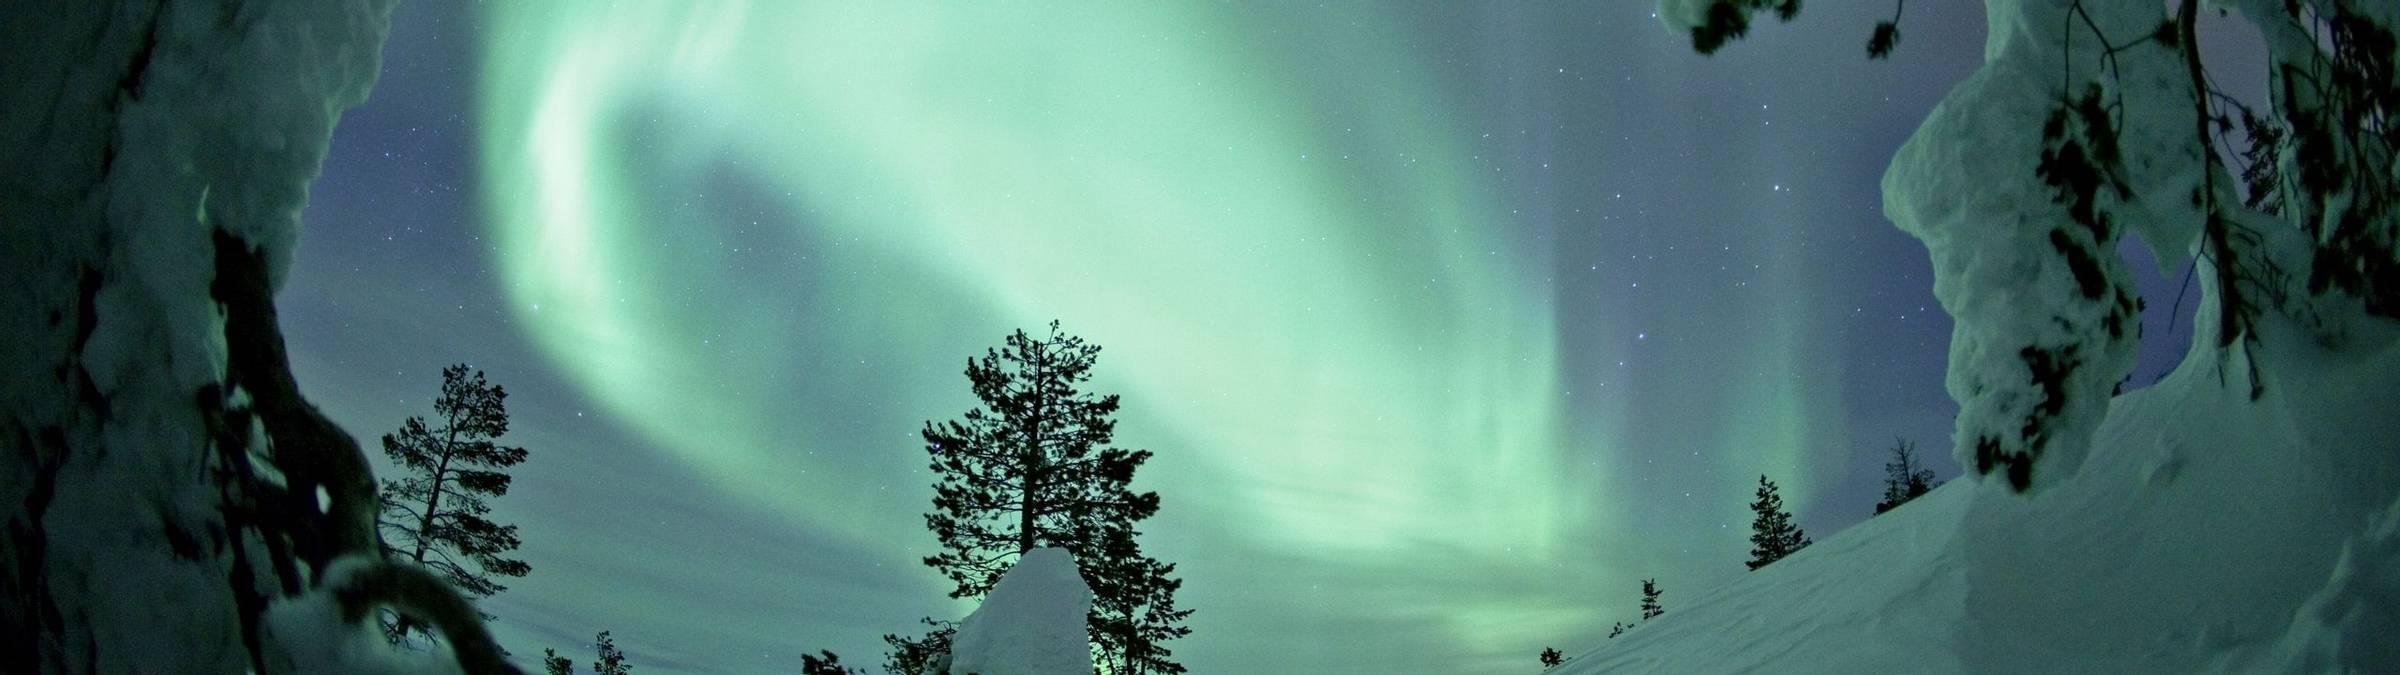 VisitFinlandAurora_4_Large RESIZED Credit Miikka Niemi, Flatlight Films & Visit Finland.jpg